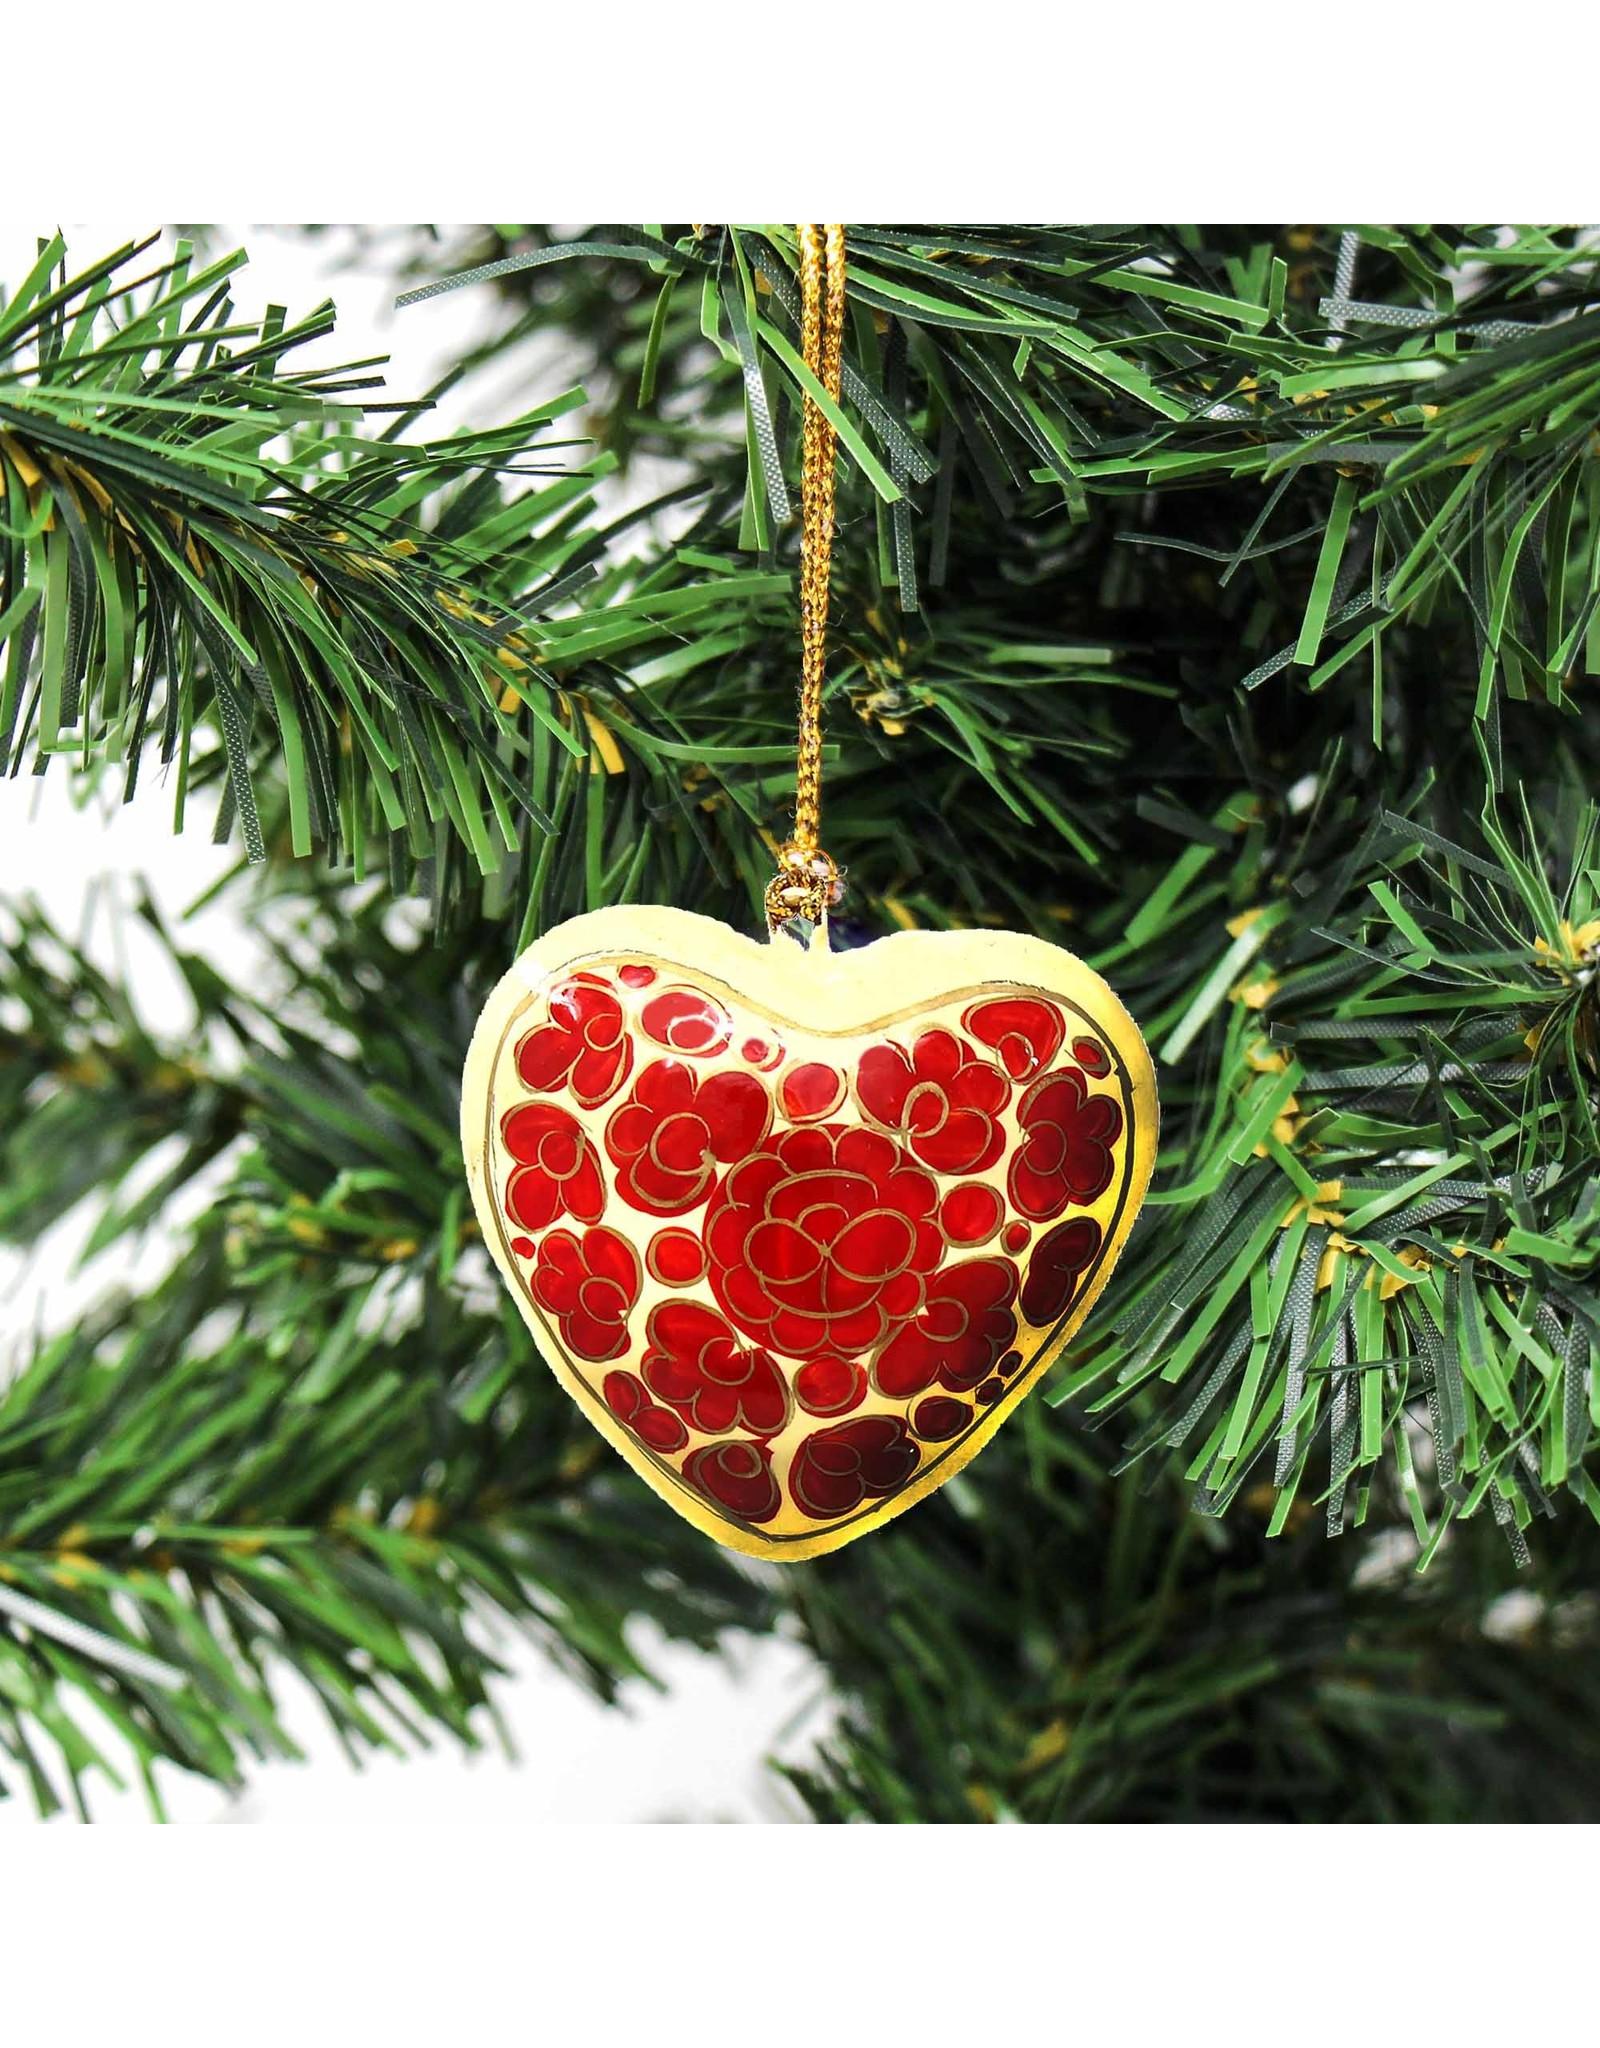 Global Crafts Hand-painted Papier-Mâché Ornament, Floral Heart, India